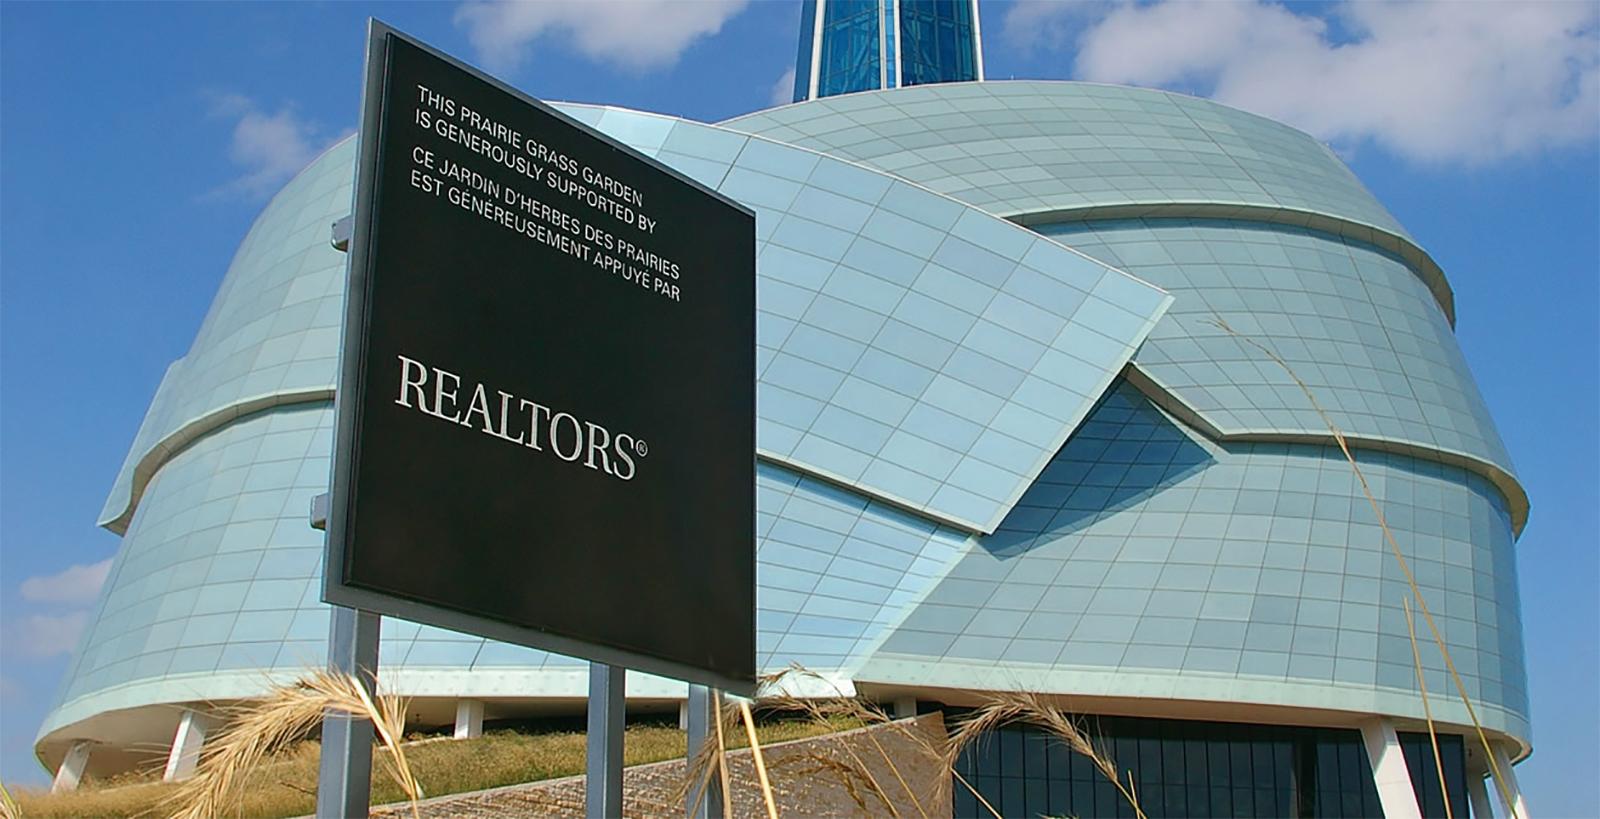 Museum Architectural Signage